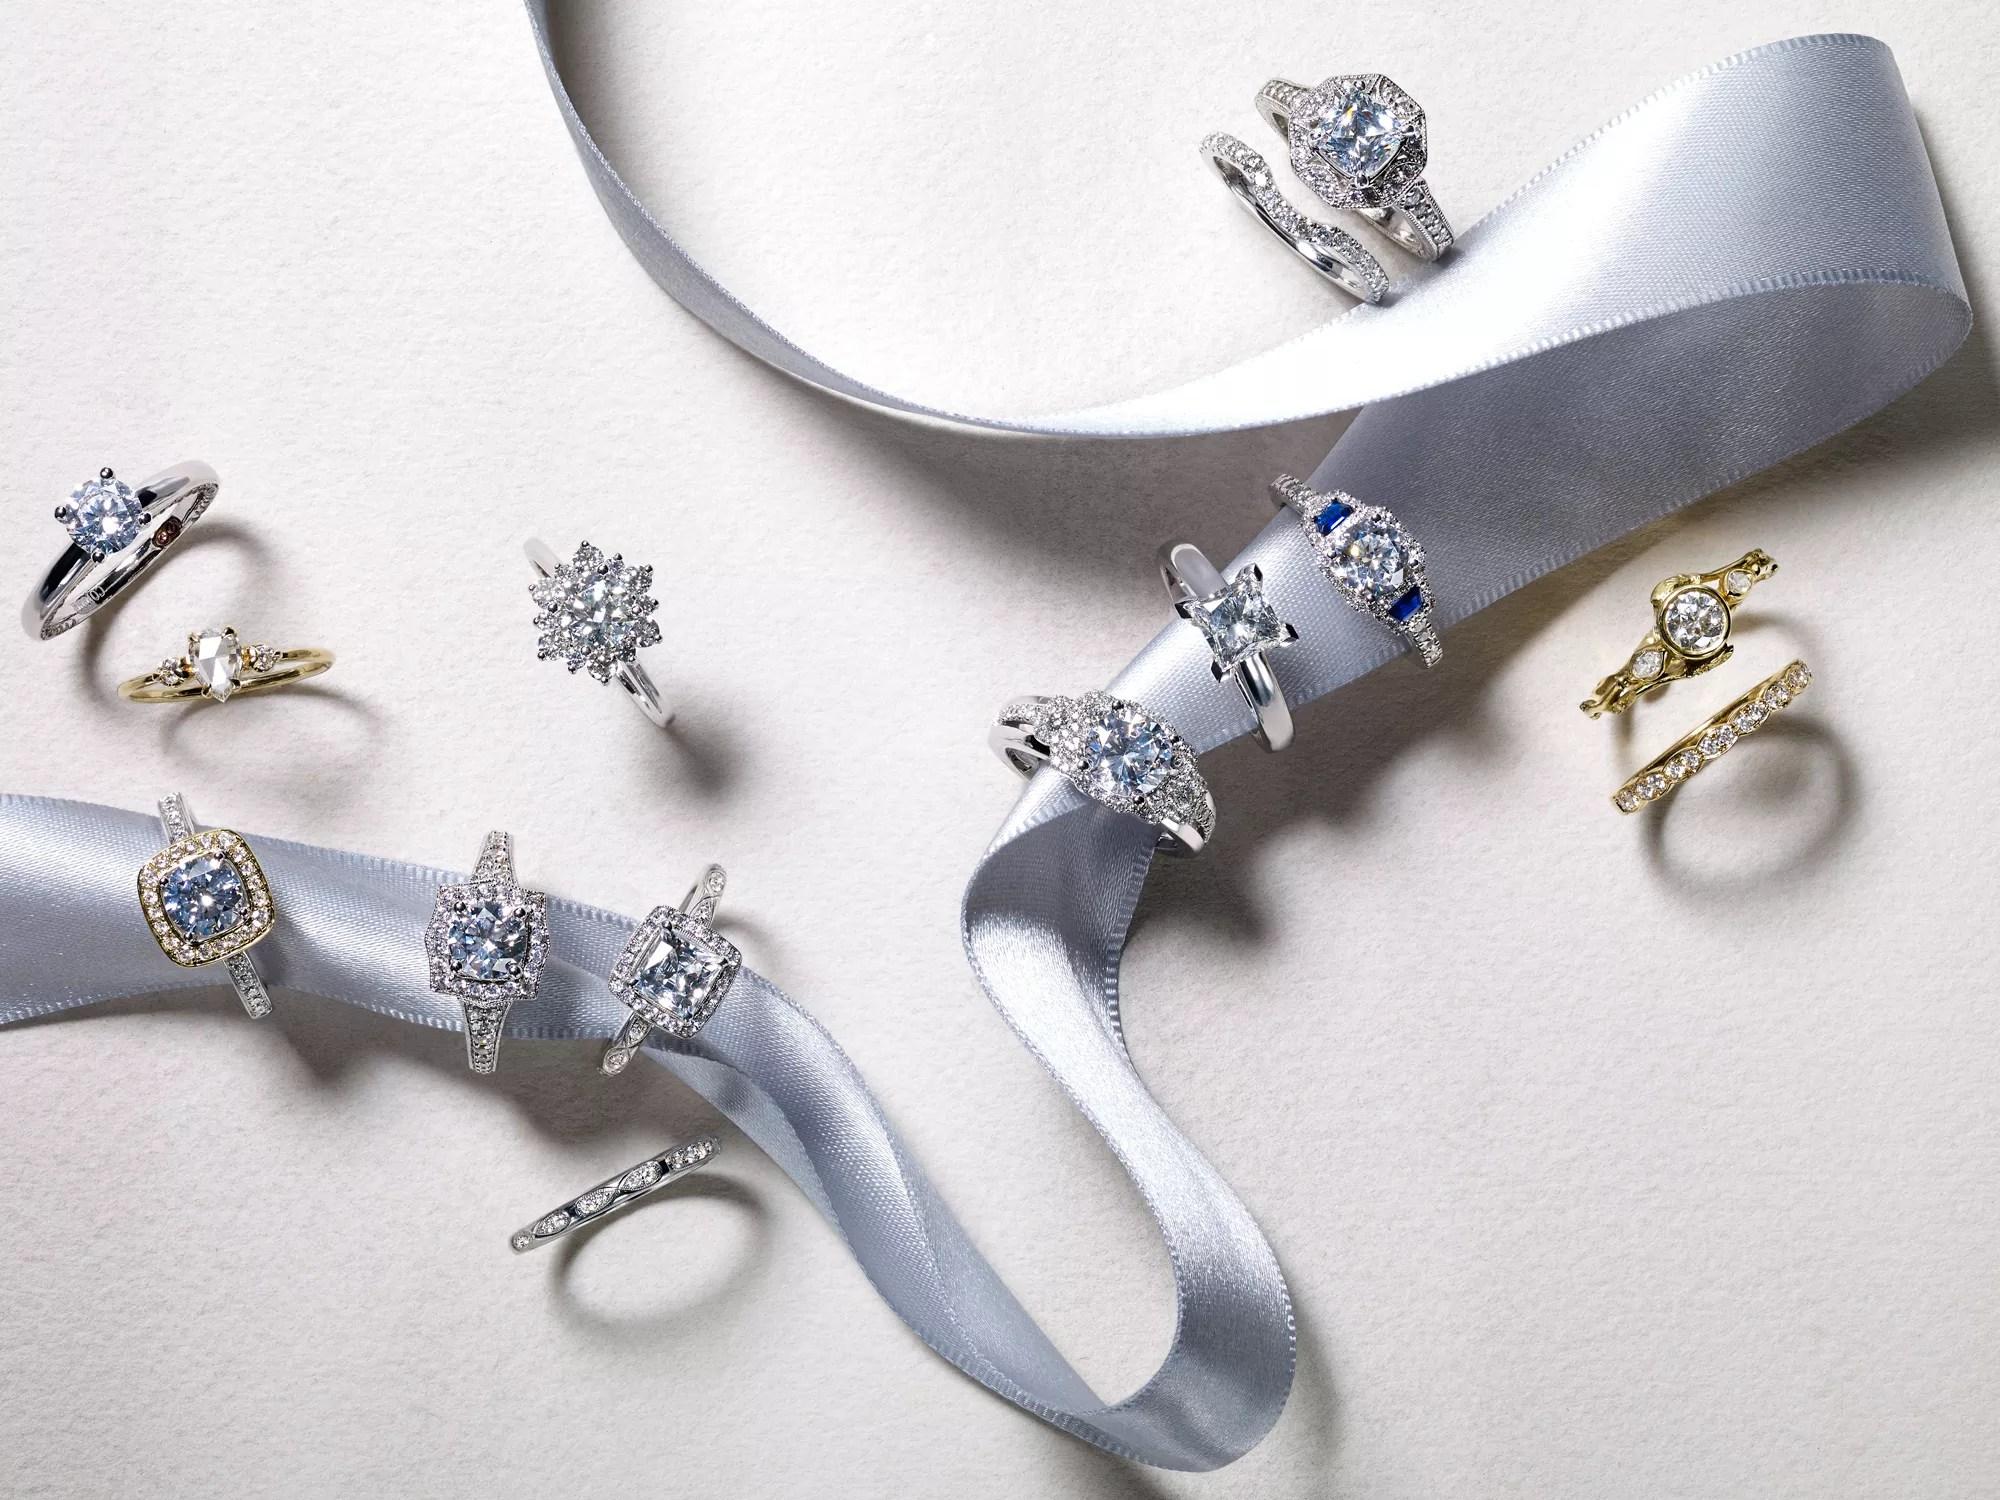 engagement ring metal types different wedding rings Engagement Ring Metal Types Engagement Ring Metal Comparison Engagement Ring Metal Glossary